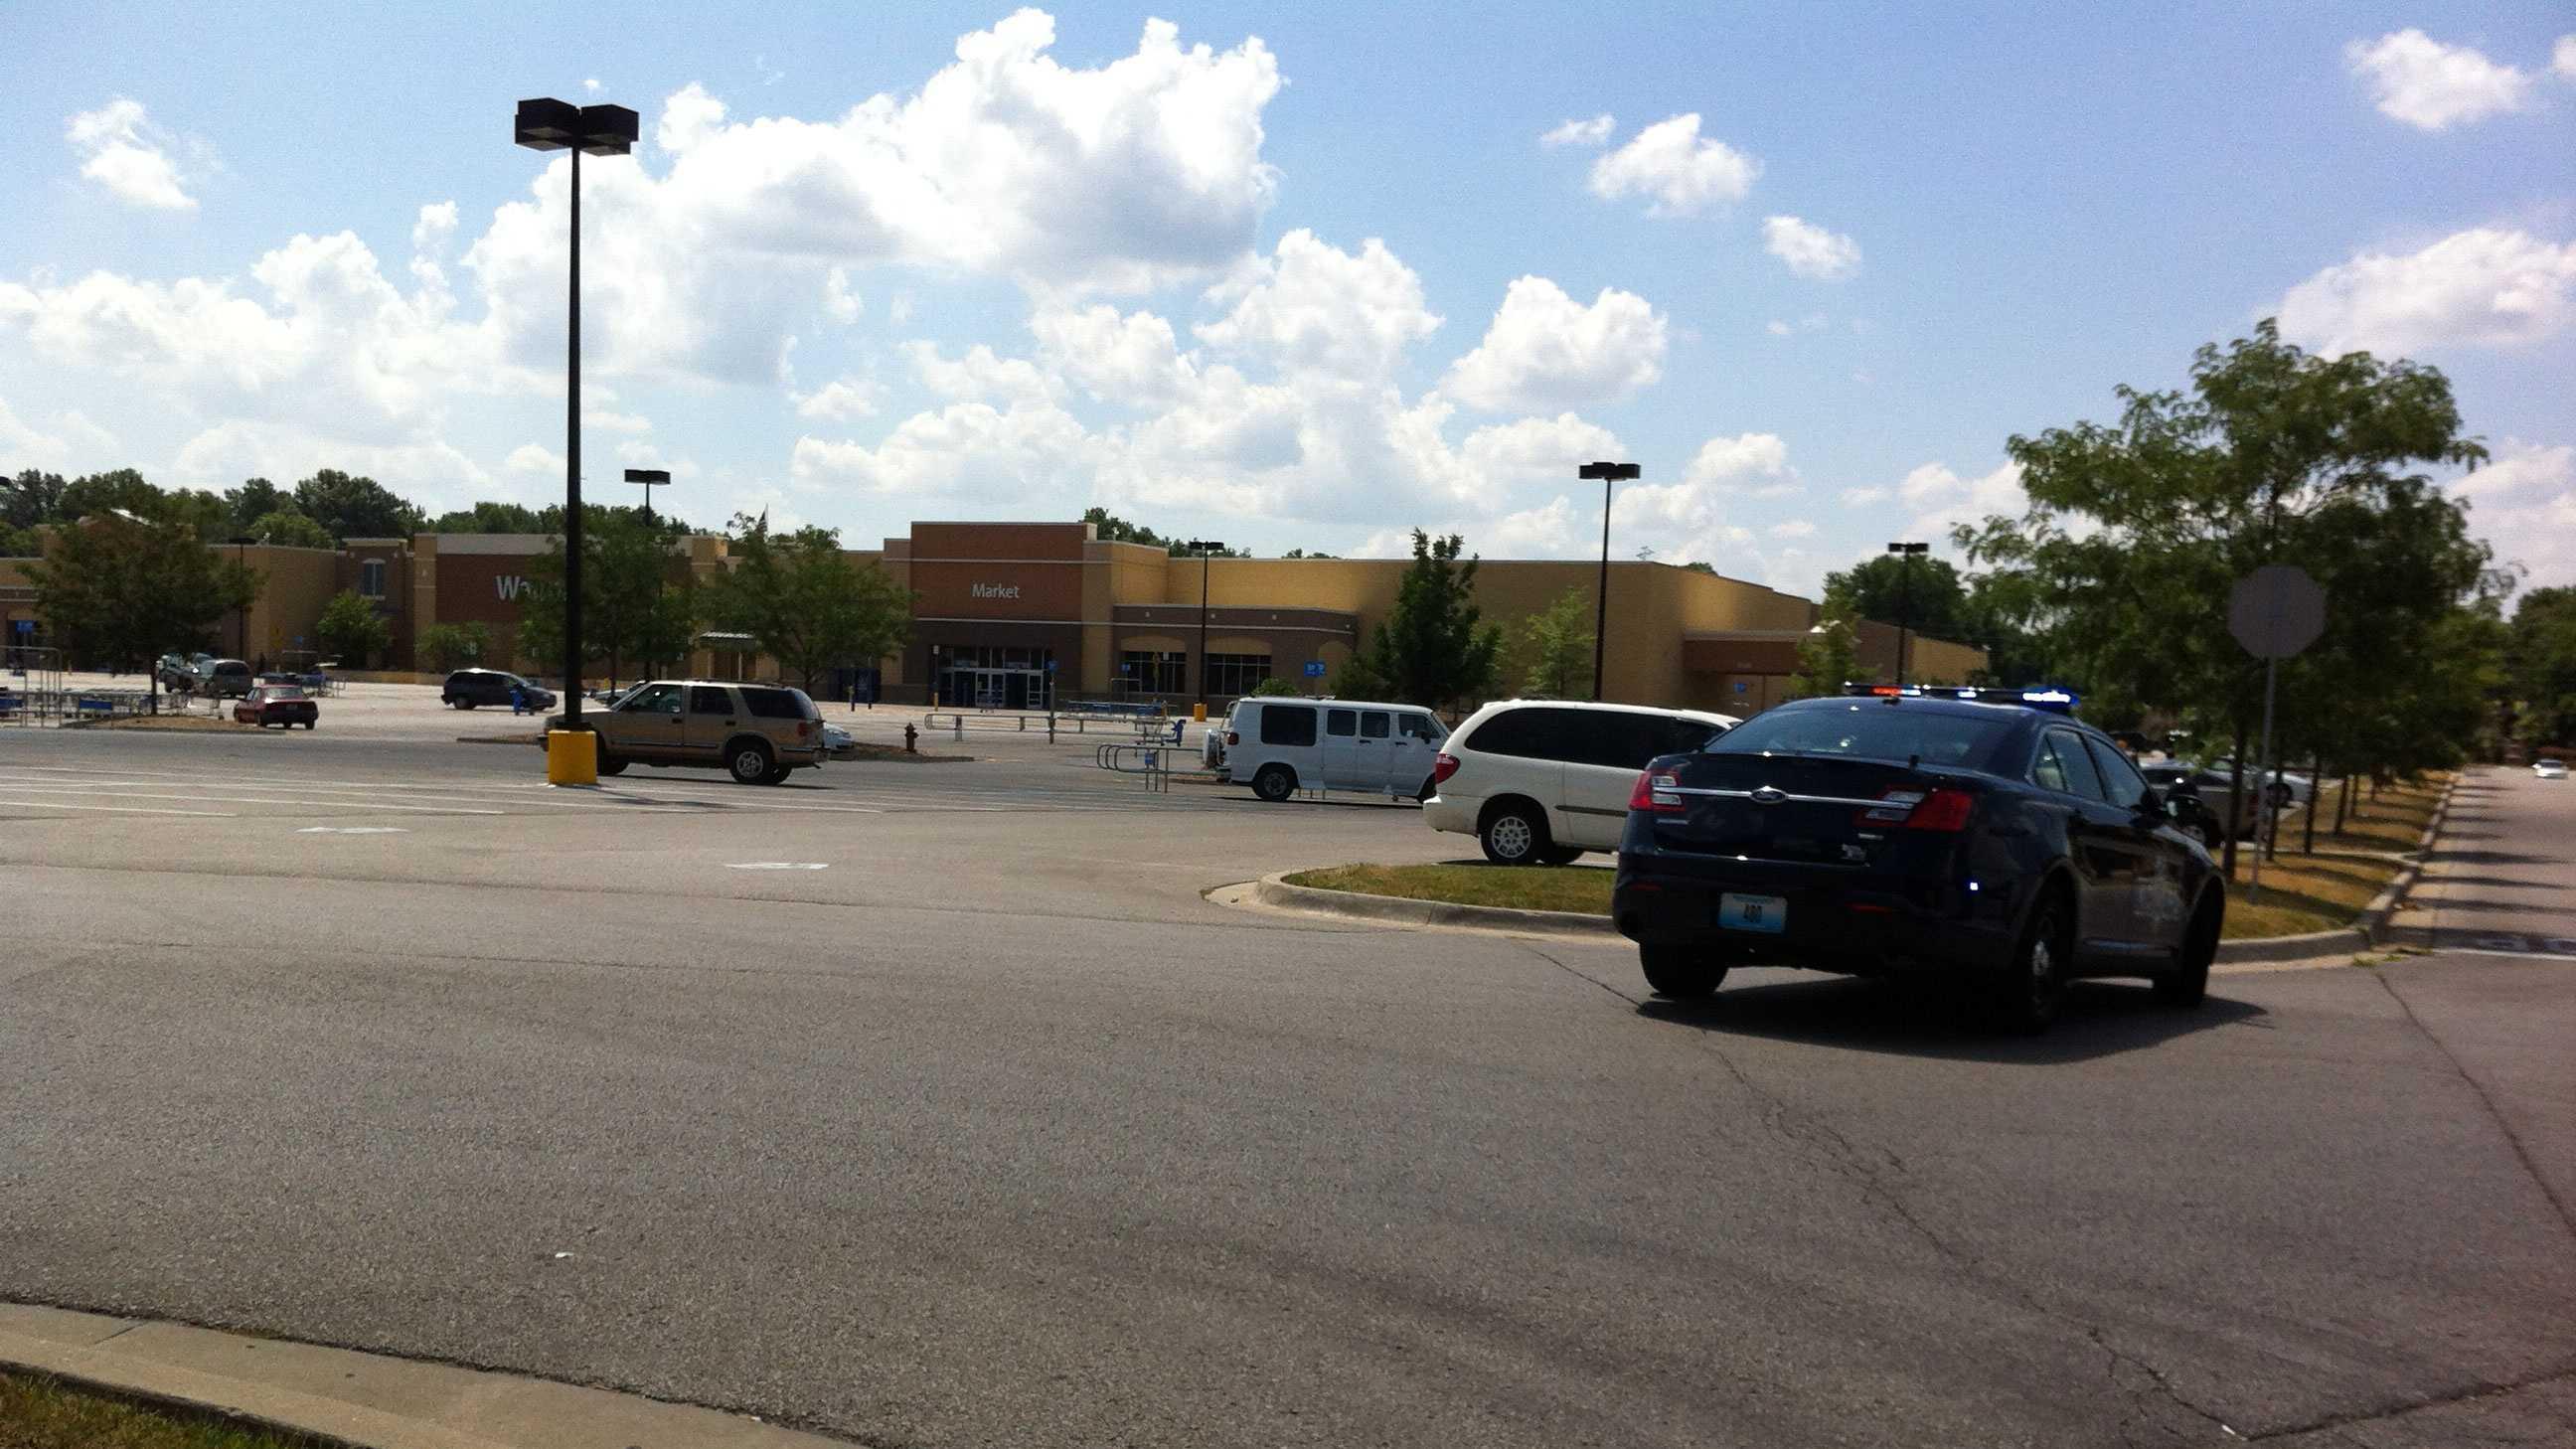 Walmart threat, U.S. 40